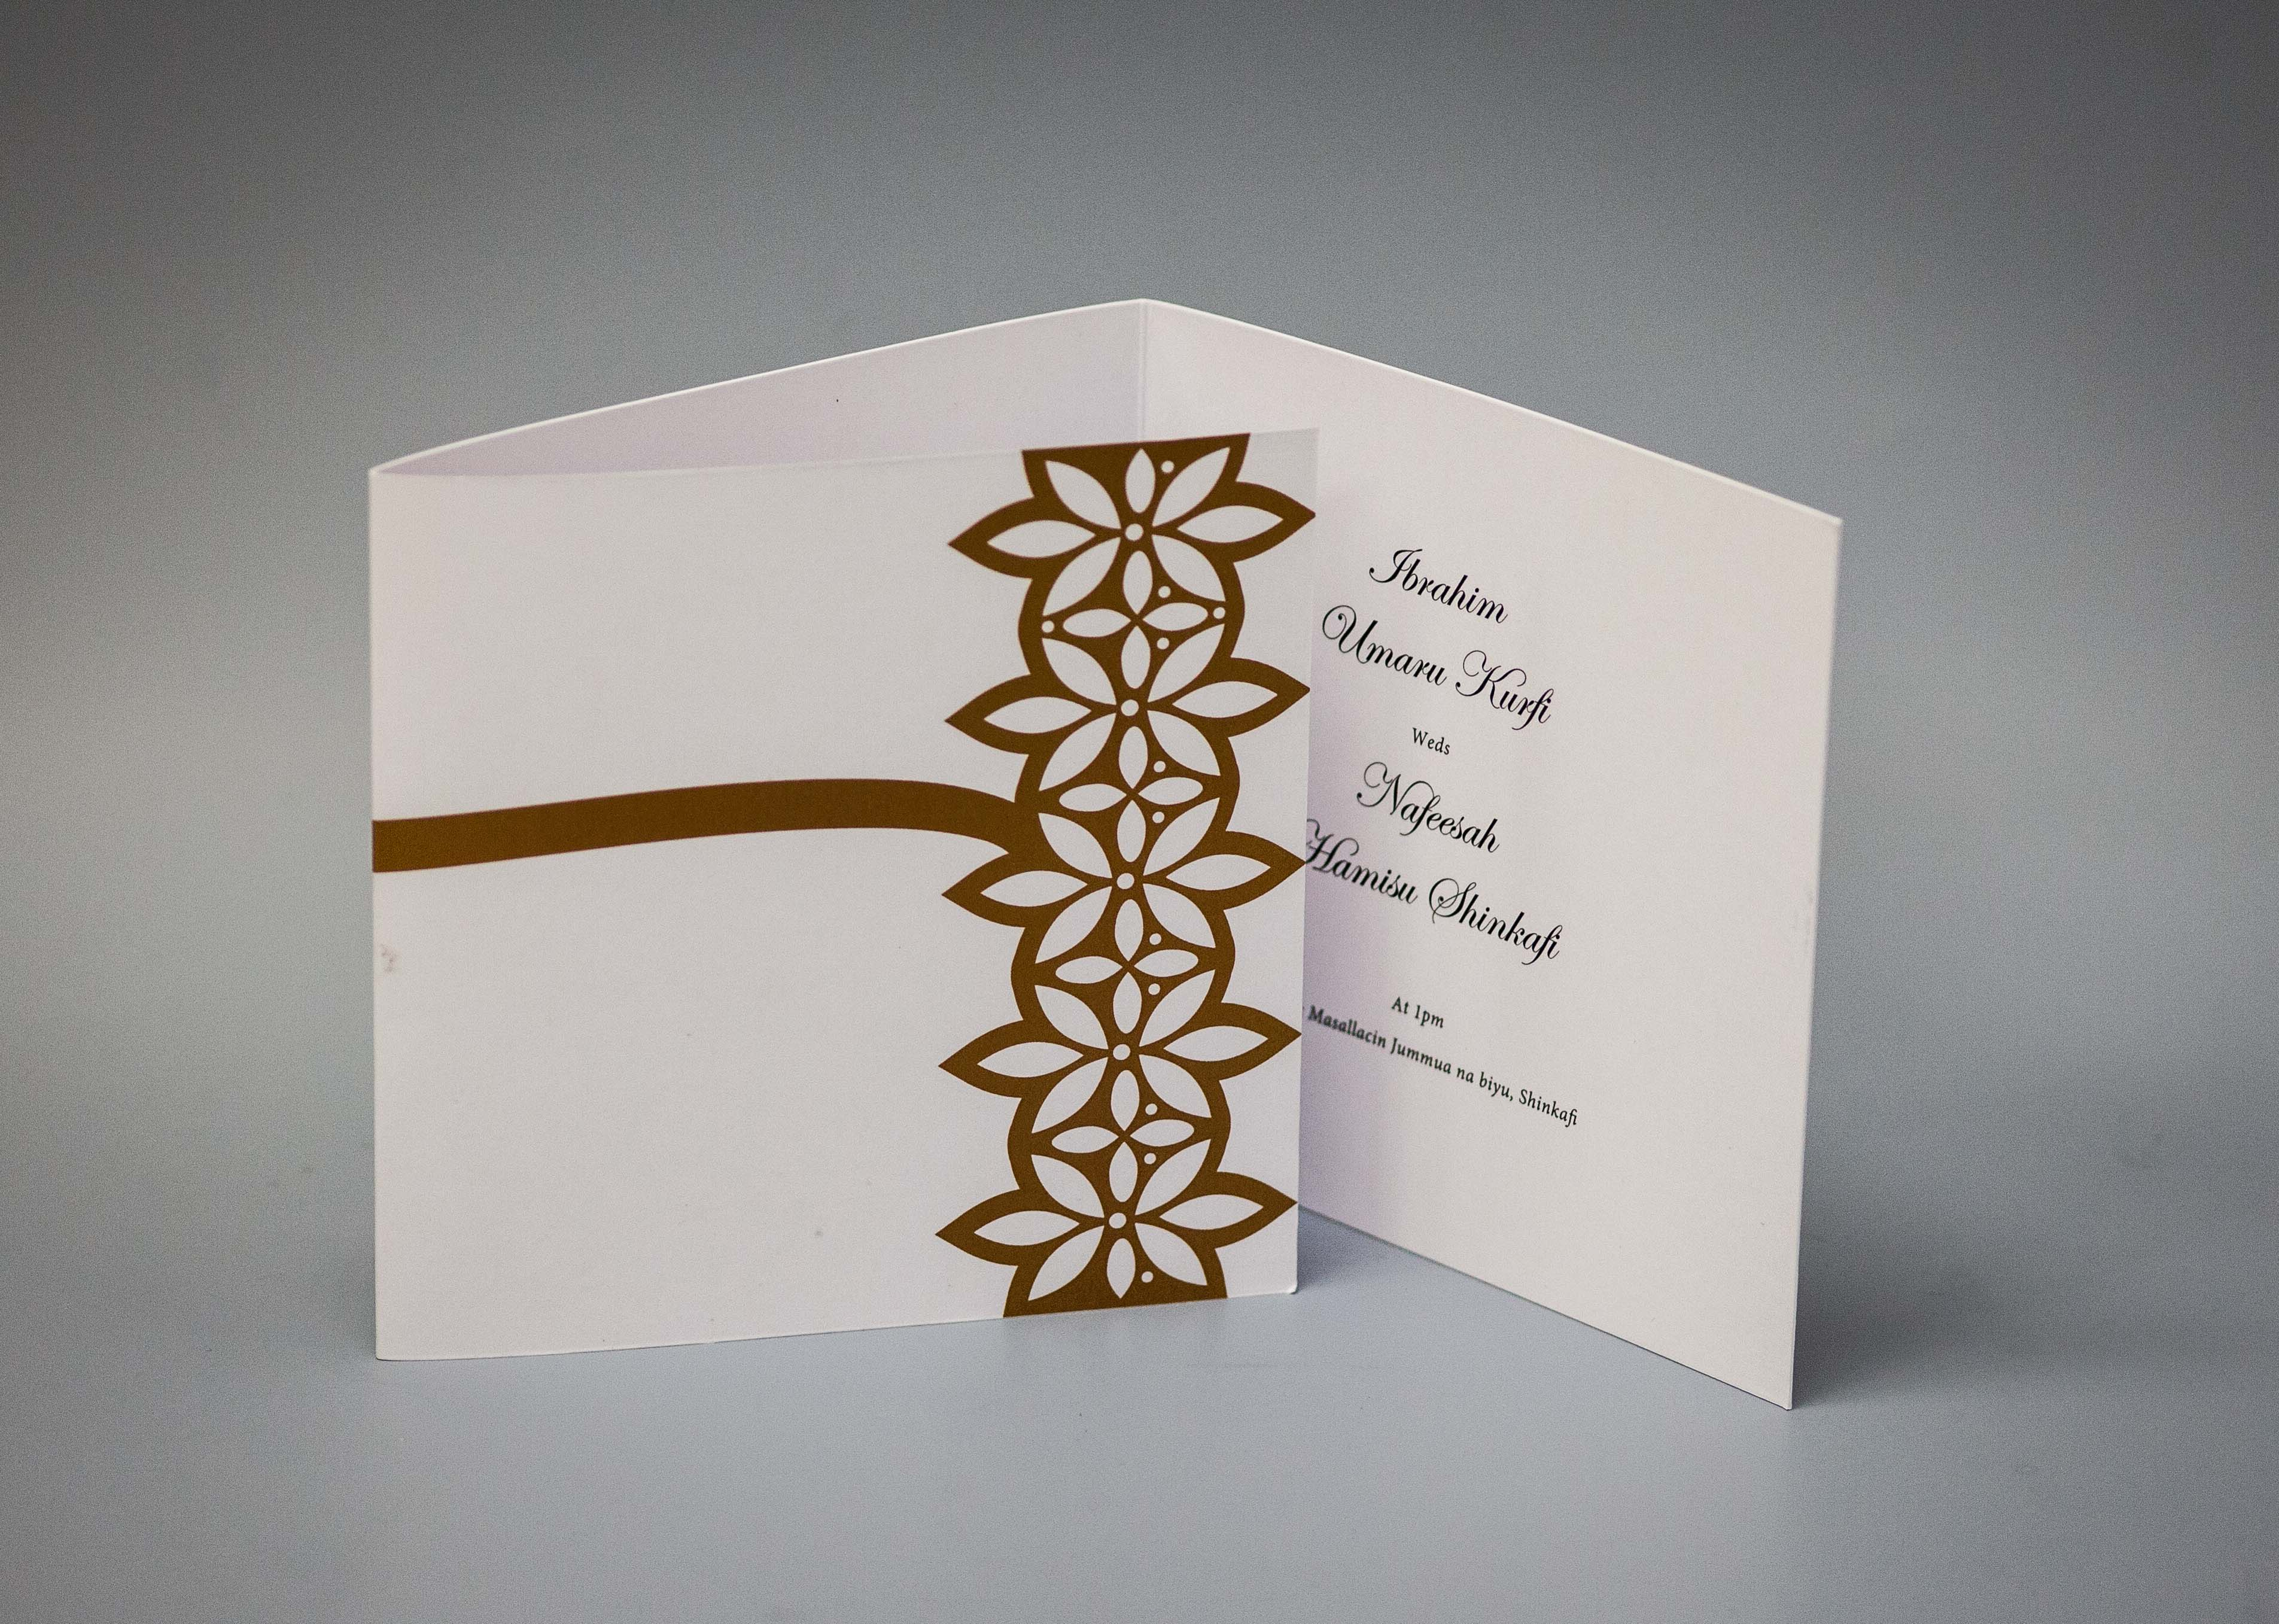 2 fold invitation